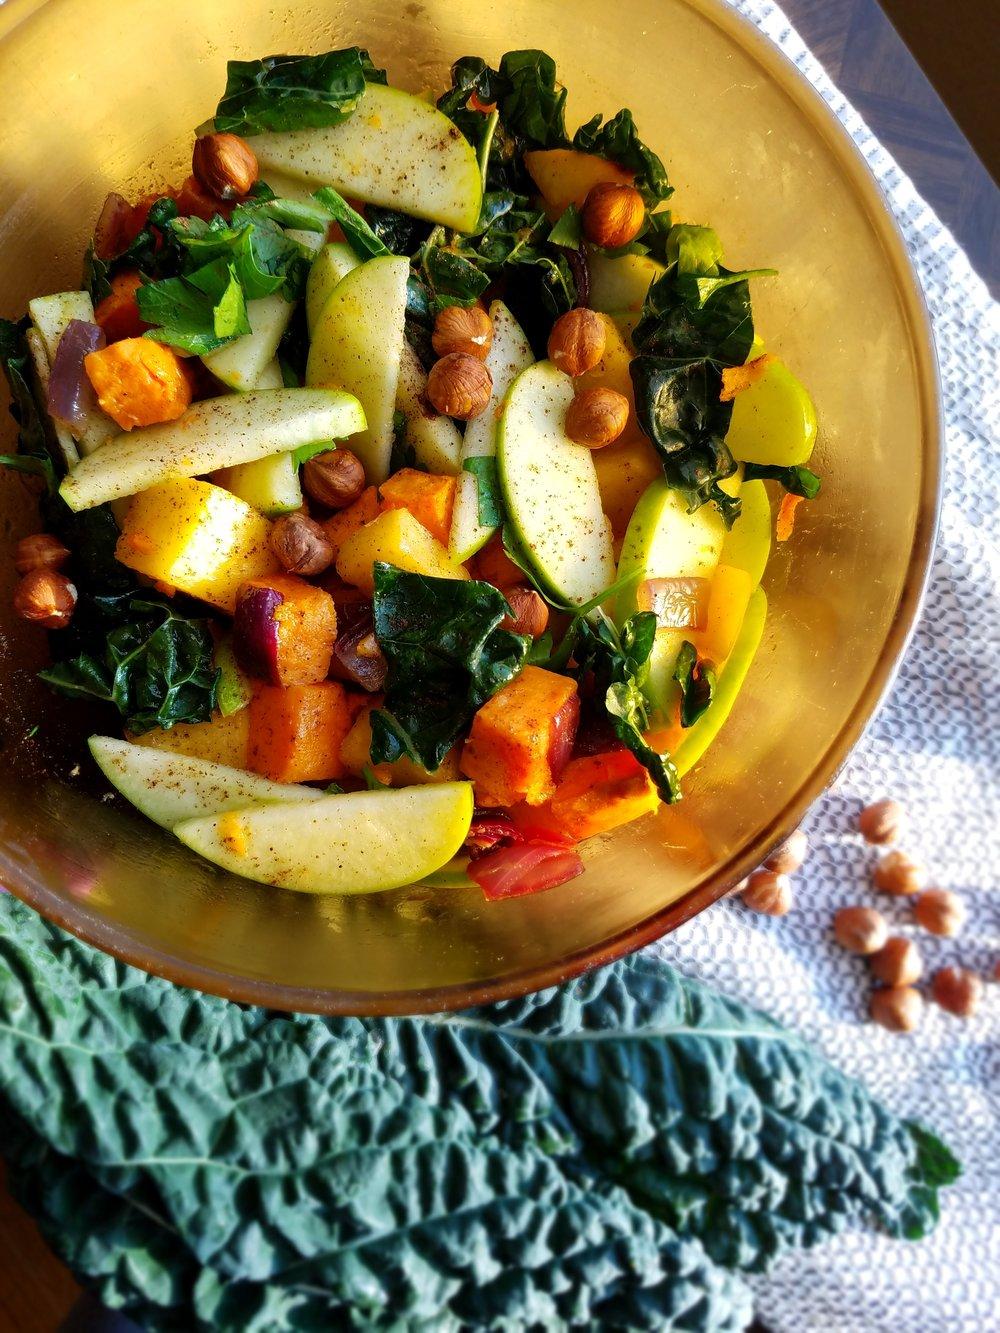 Roasted Sweet Potato, Rutabaga and Green Apple Salad with Hazelnut VInaigrette.jpg